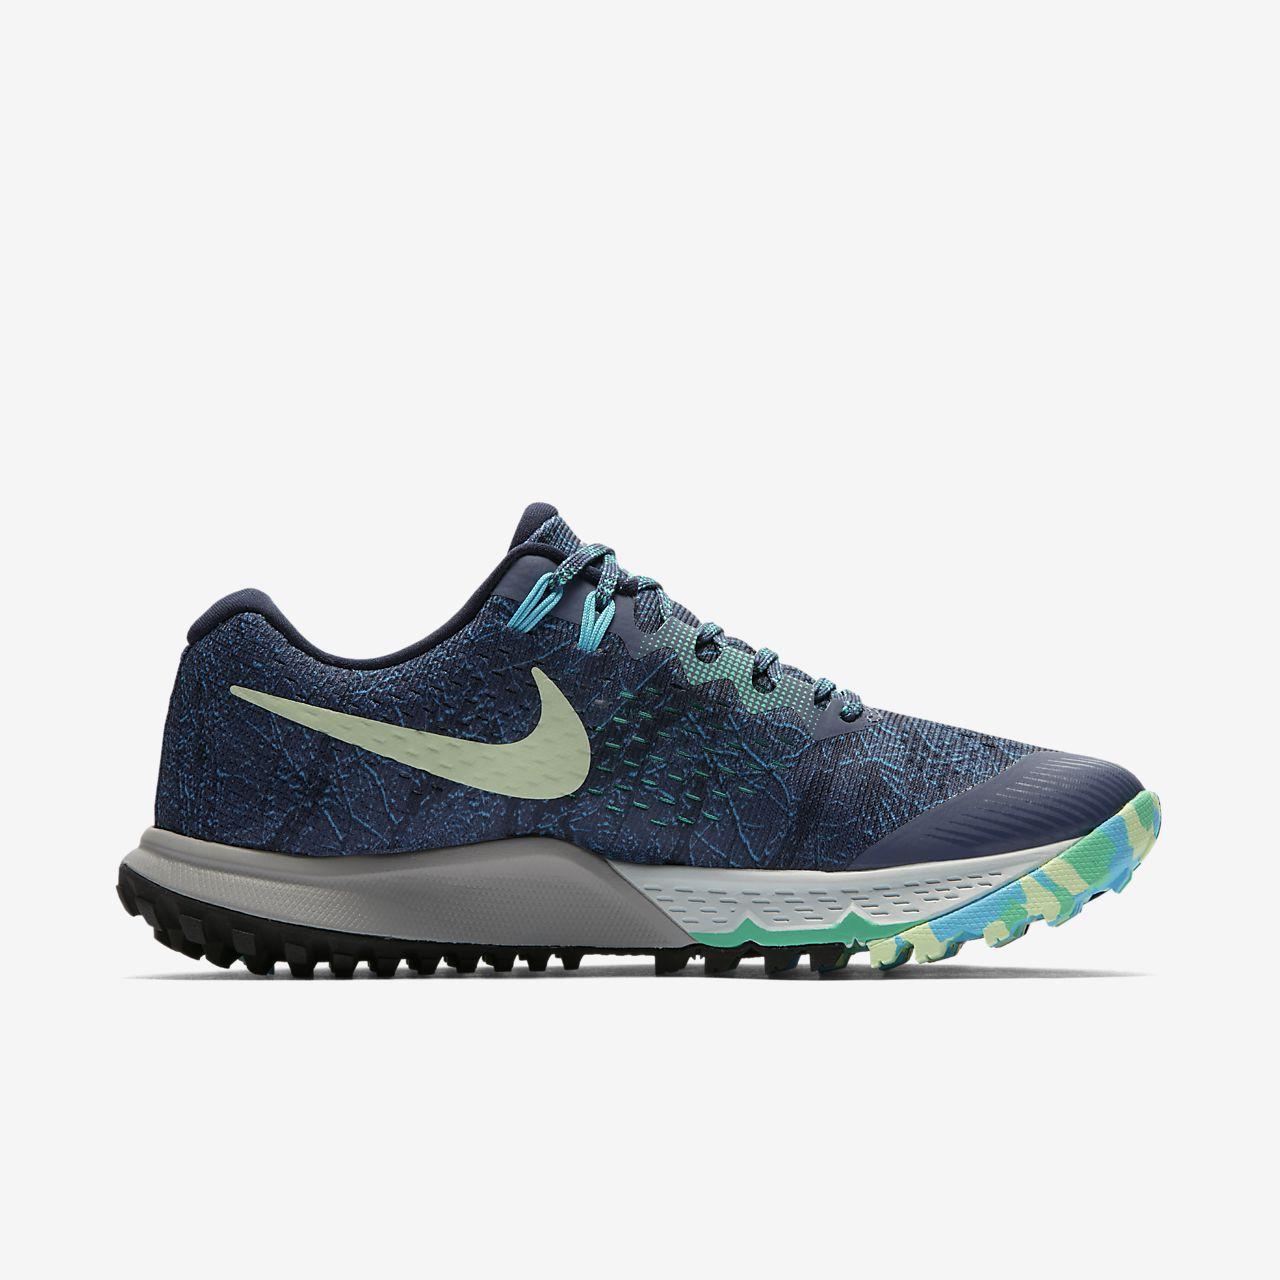 b562e80dadf Nike Air Zoom Terra Kiger 4 Women s Running Shoe. Nike.com CA